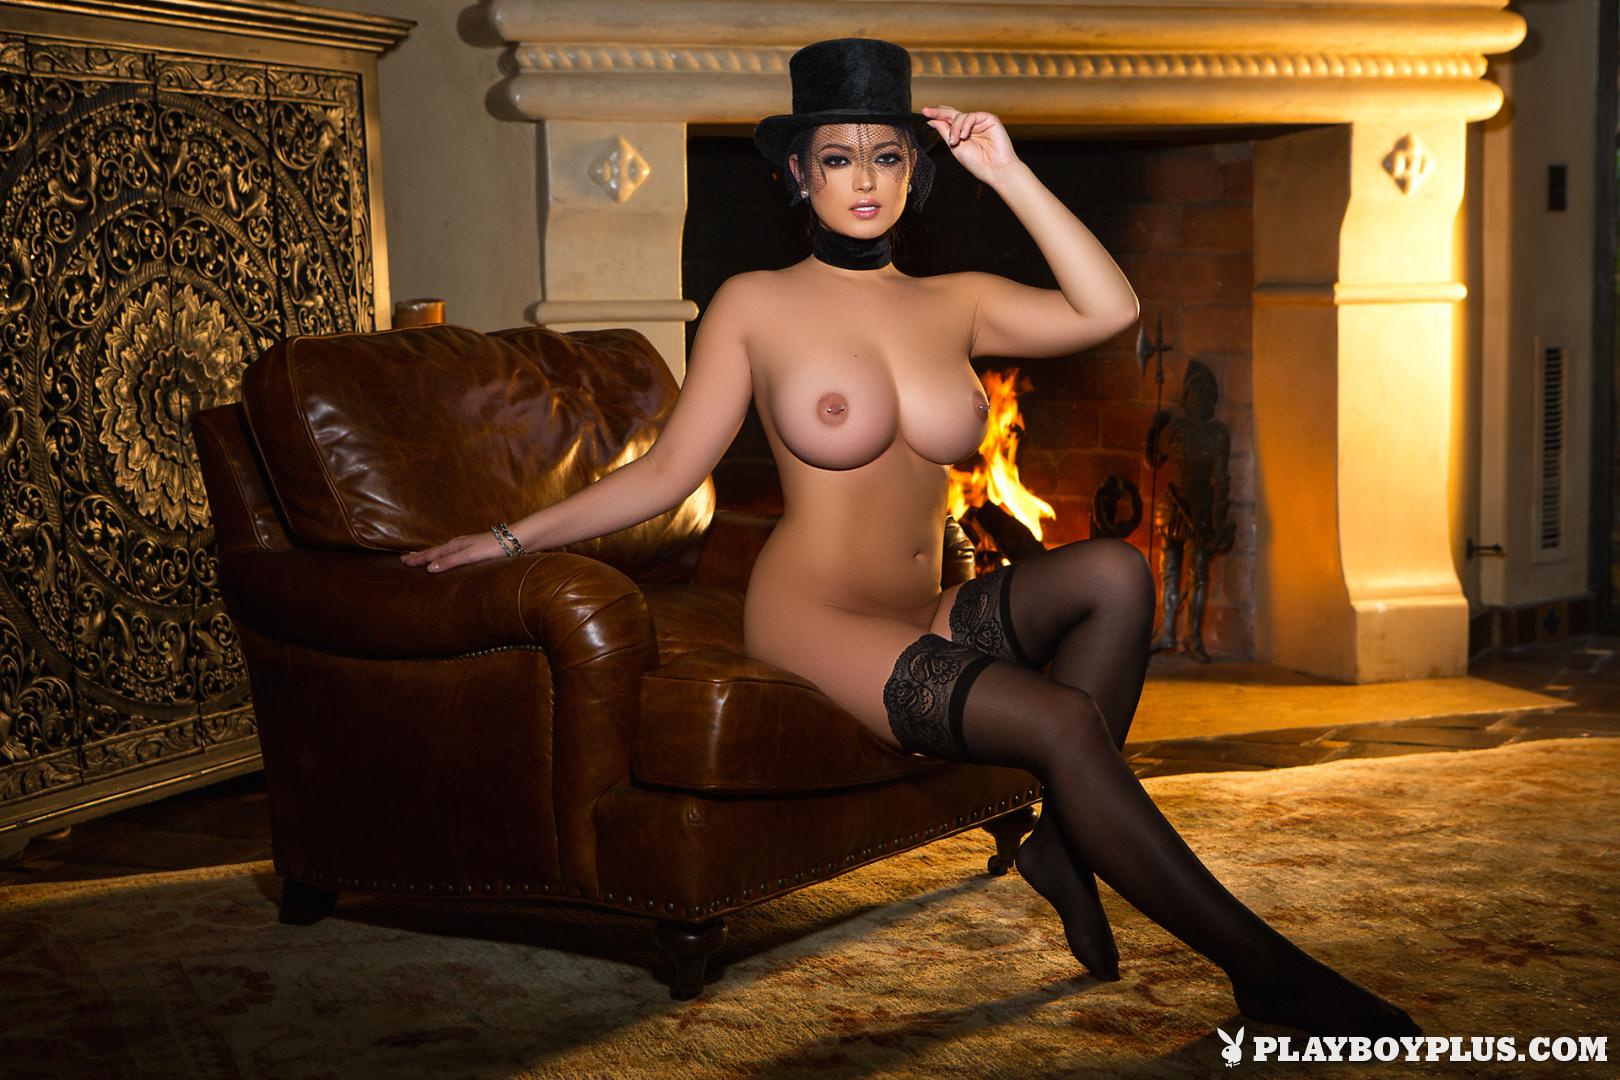 Chelsie Aryn Big Boobs Riding Outfit